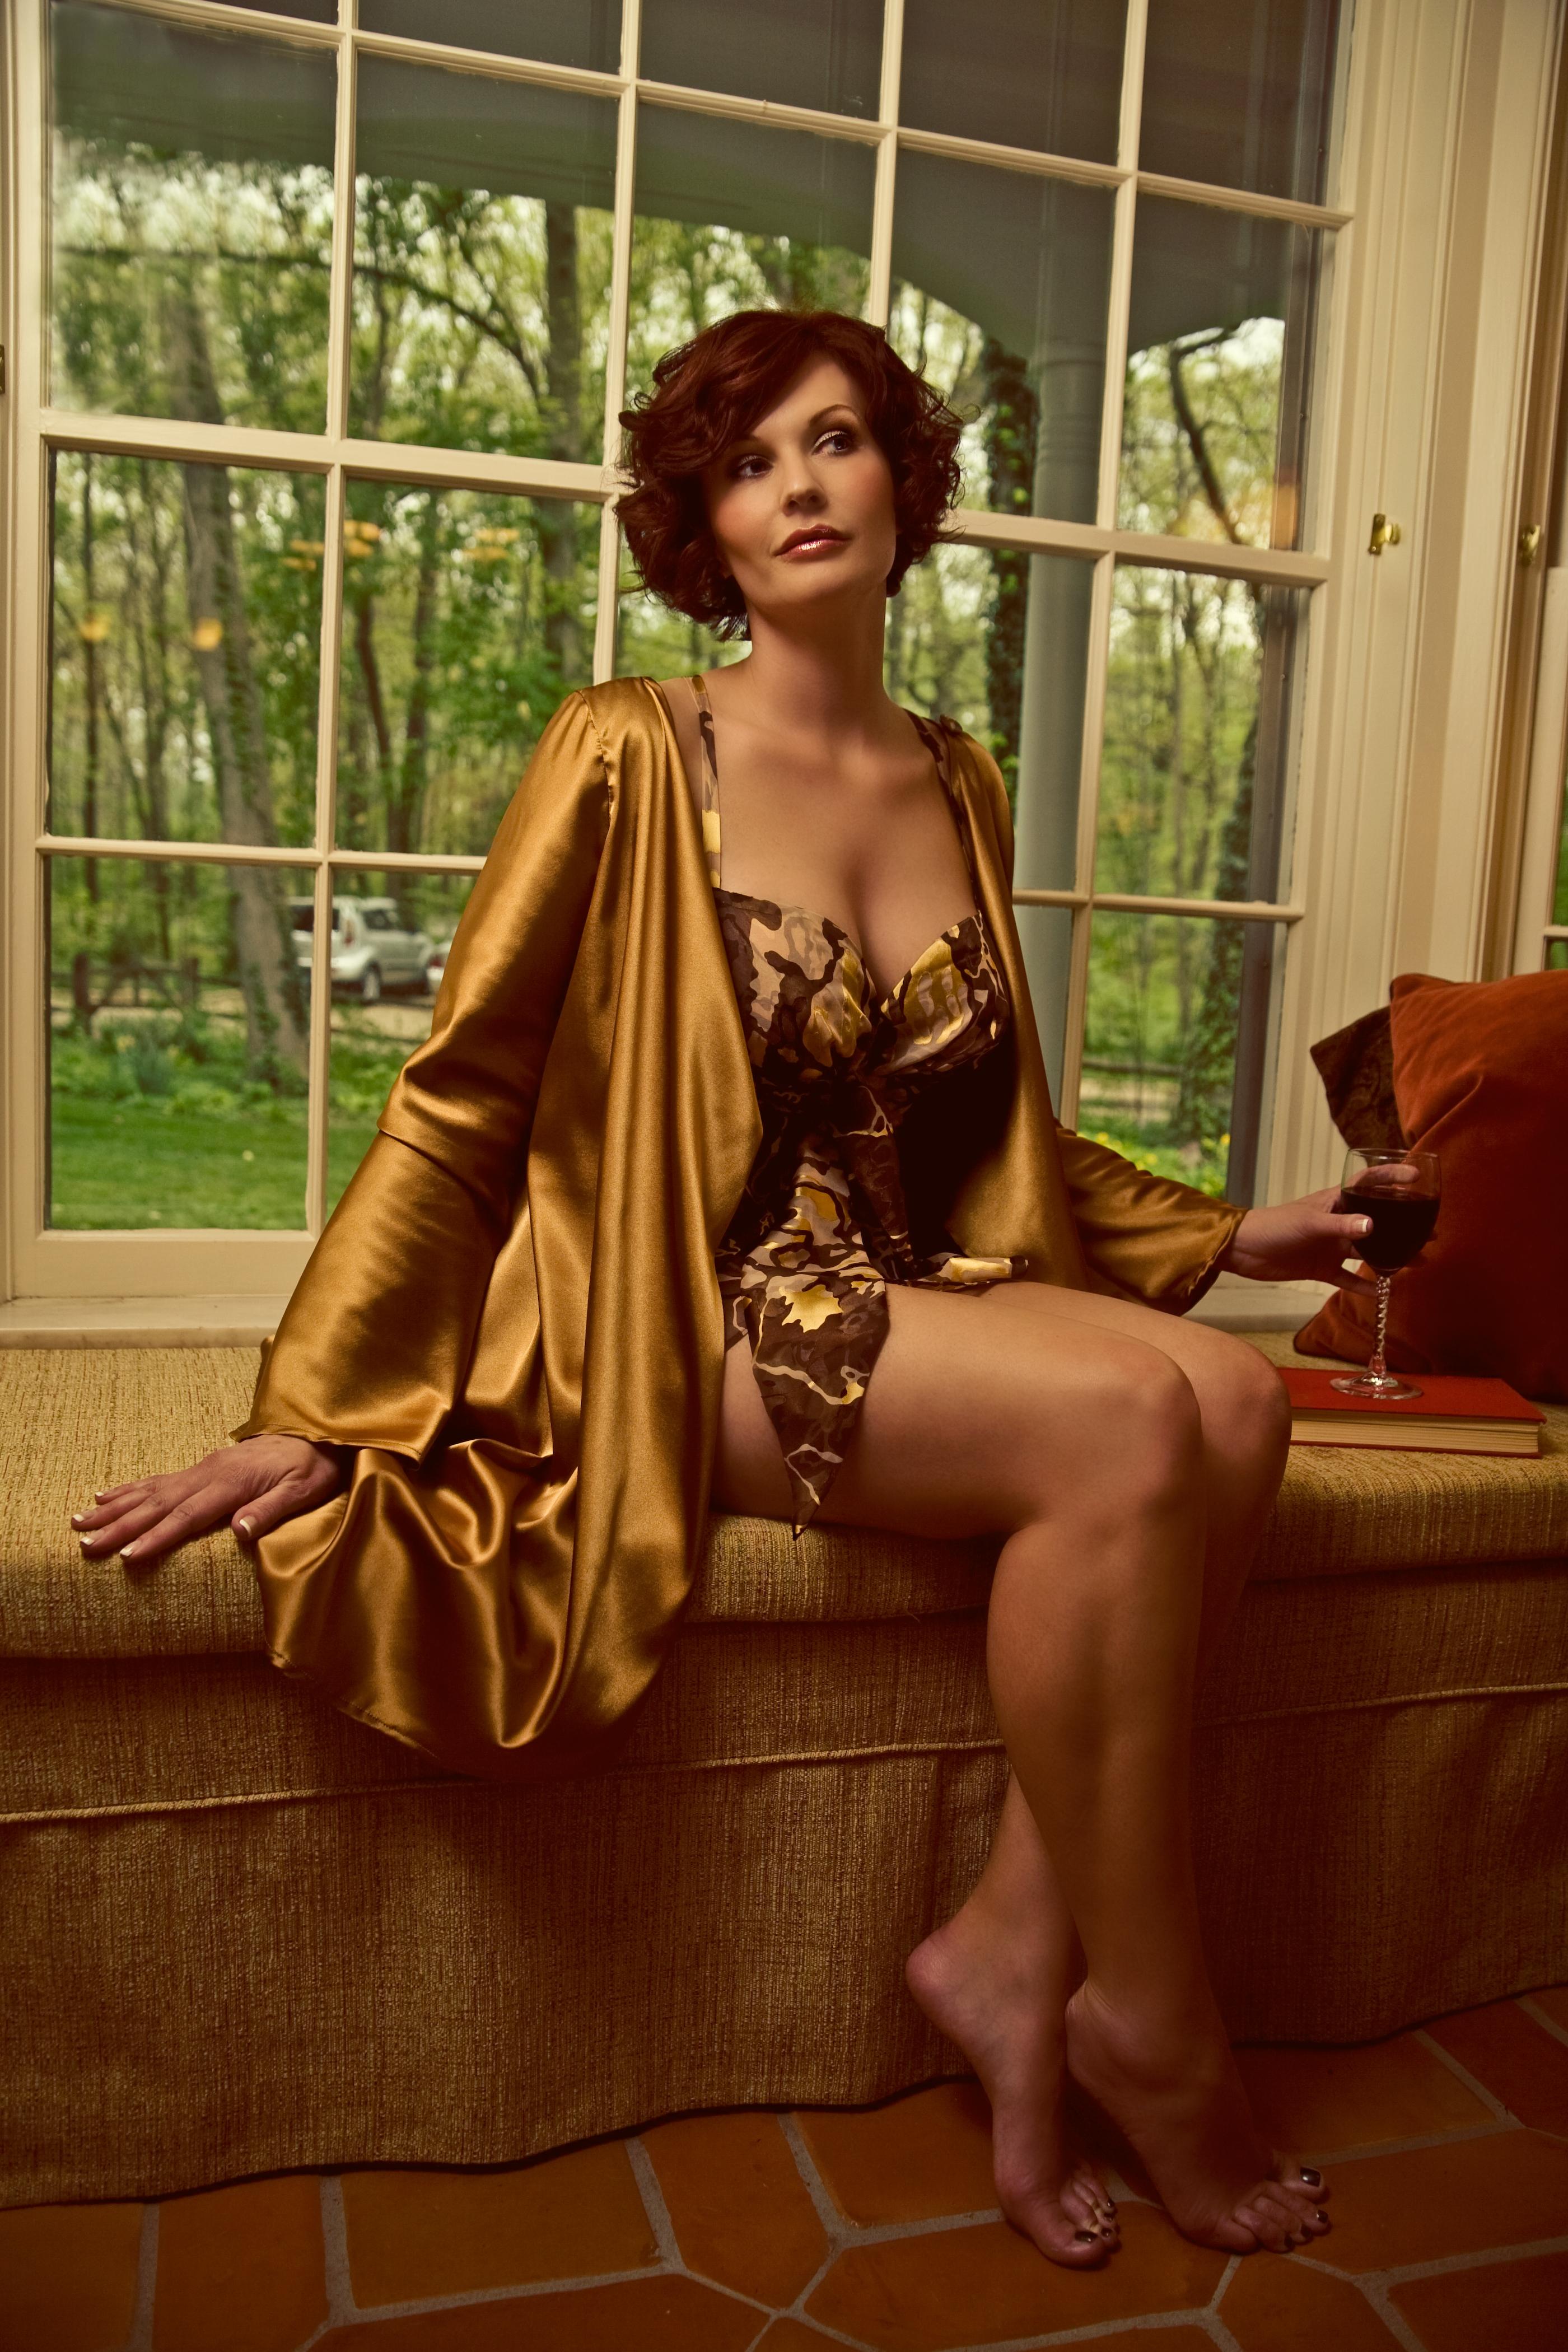 luxury nightwear e-tailer certain style announces new 'sunshine